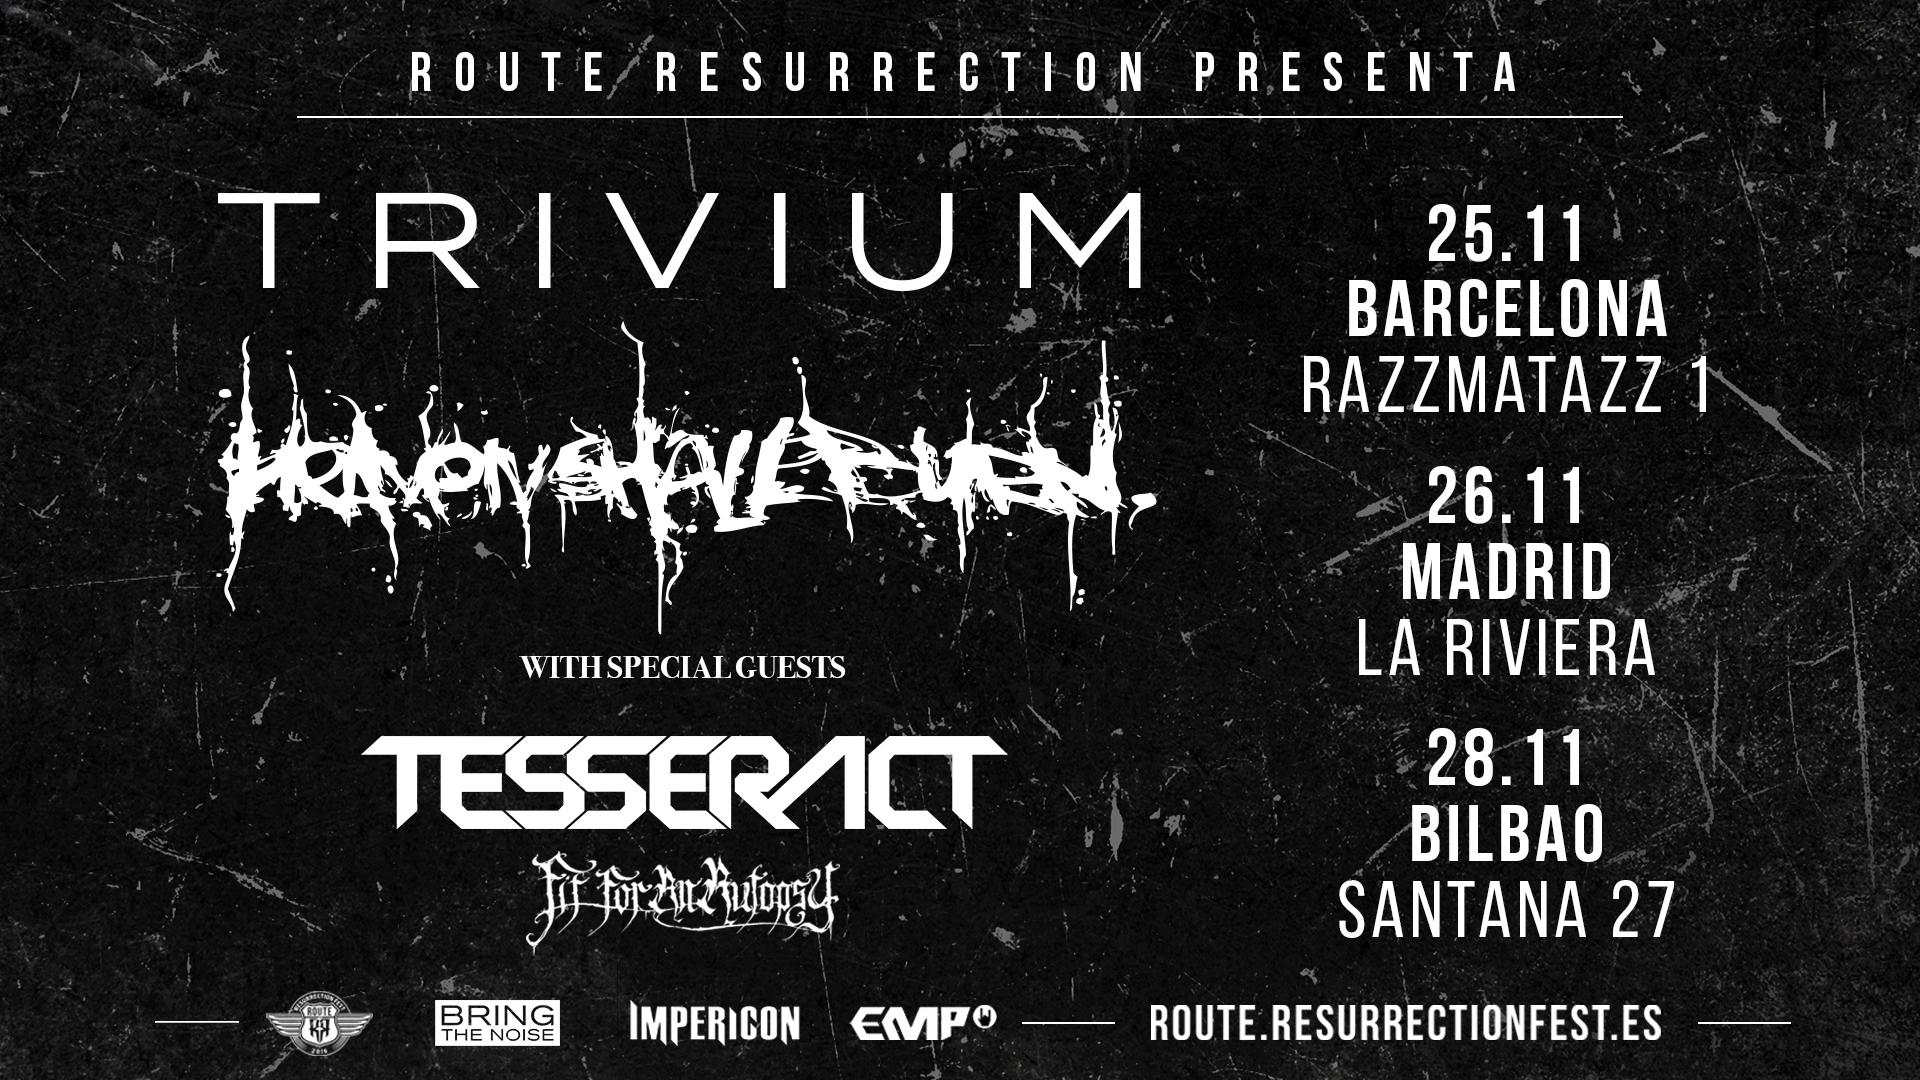 Route Resurrection Fest 2021 - Trivium - Heaven Shall Burn- Event